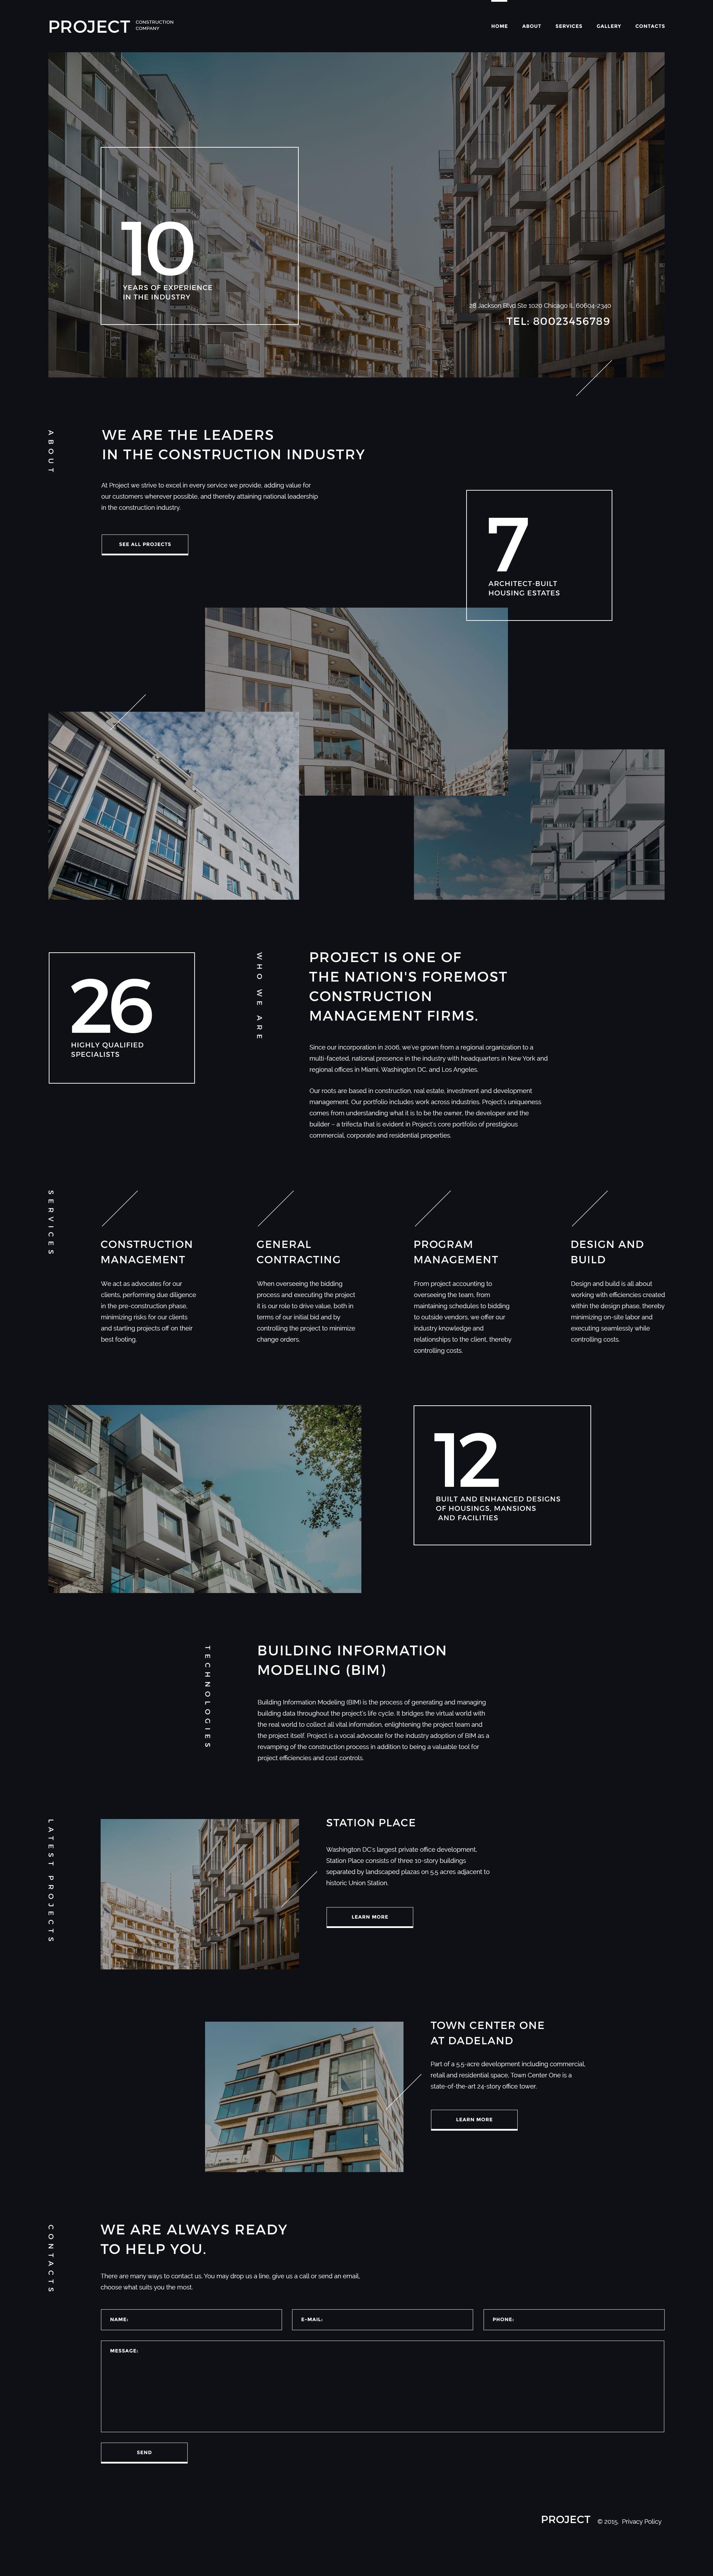 Project Construction Company Website Template | kana imc | Pinterest ...